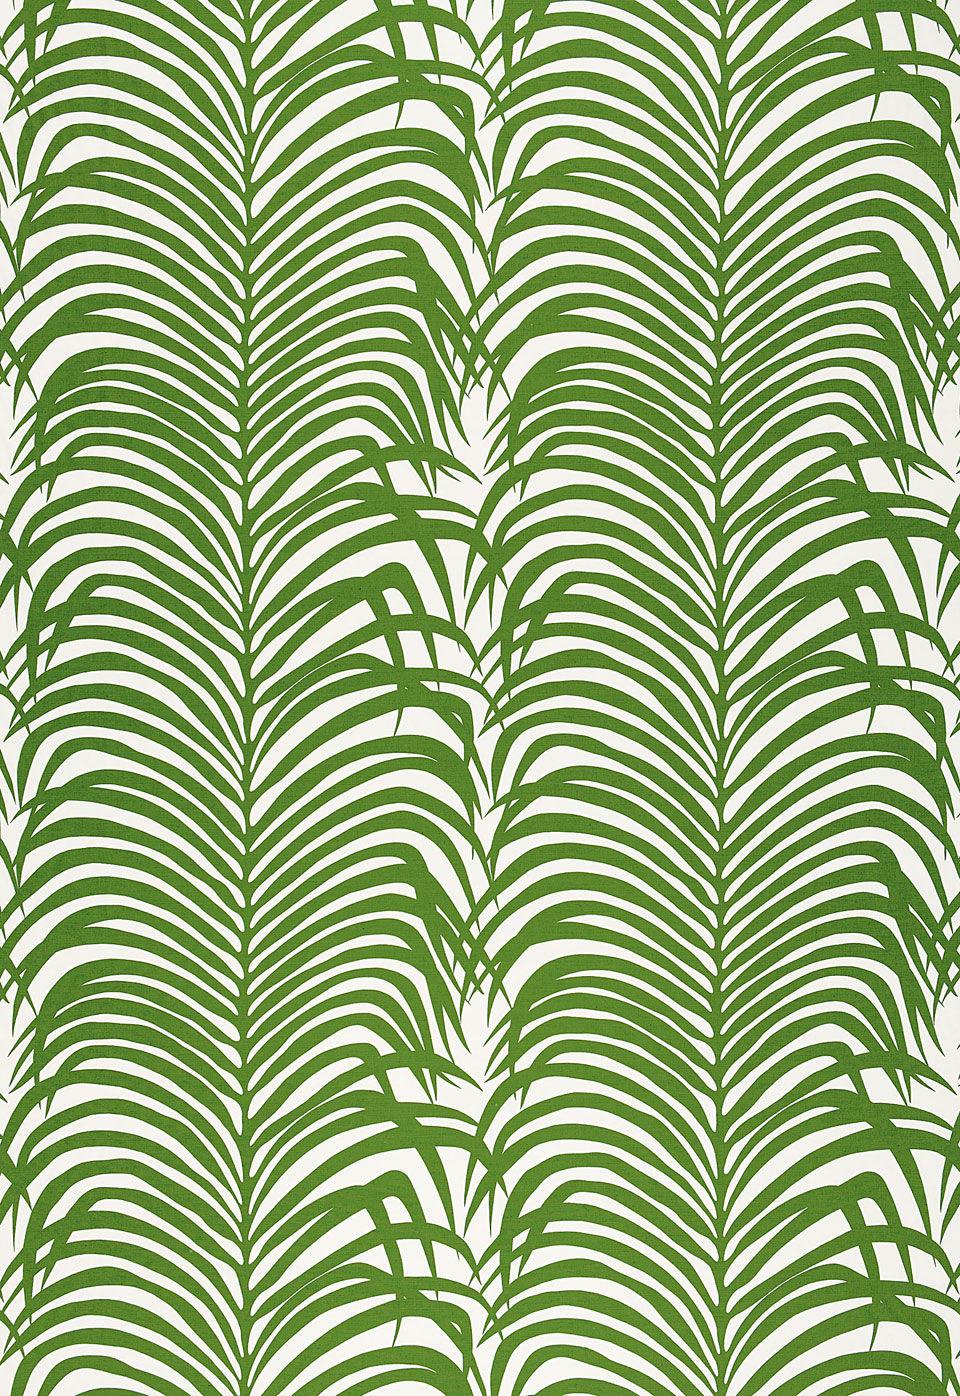 Safari Pattern Wallpaper photo - 2